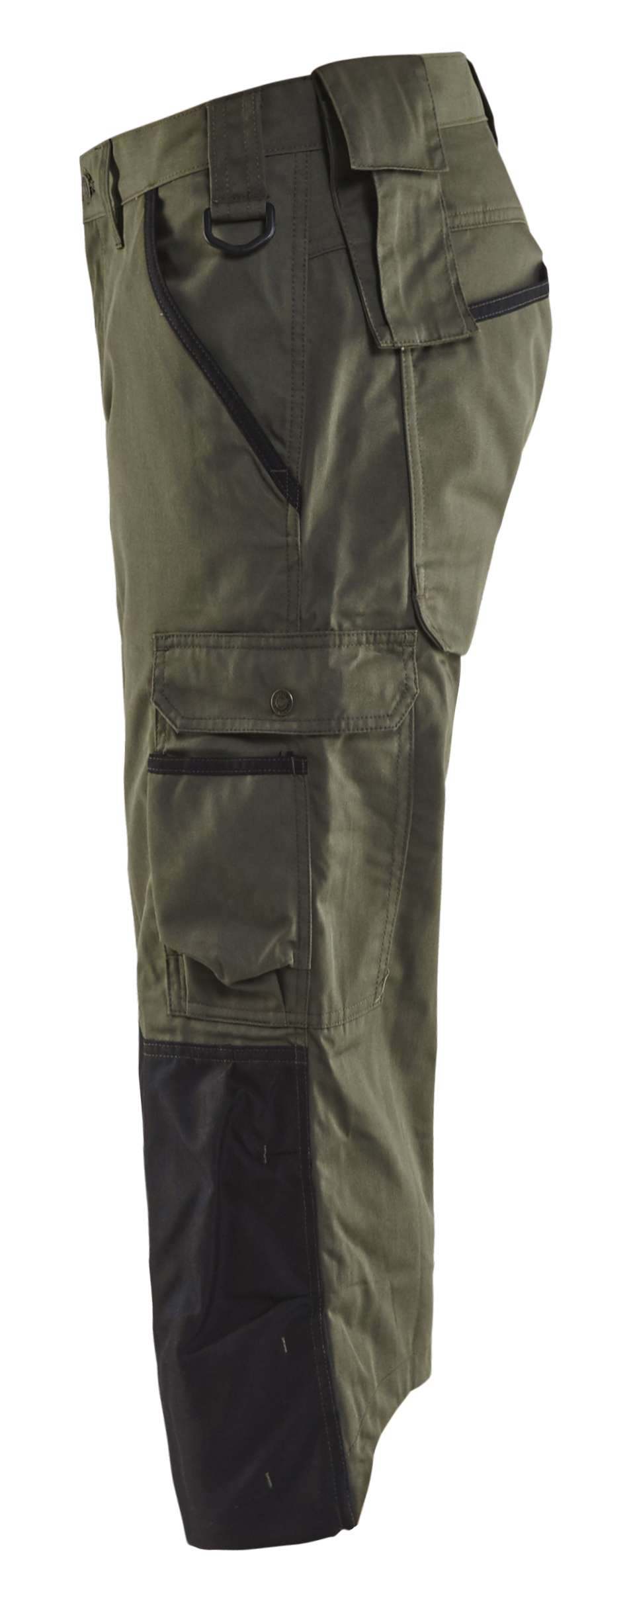 Blaklader Broeken 14551835 army groen-zwart(4699)